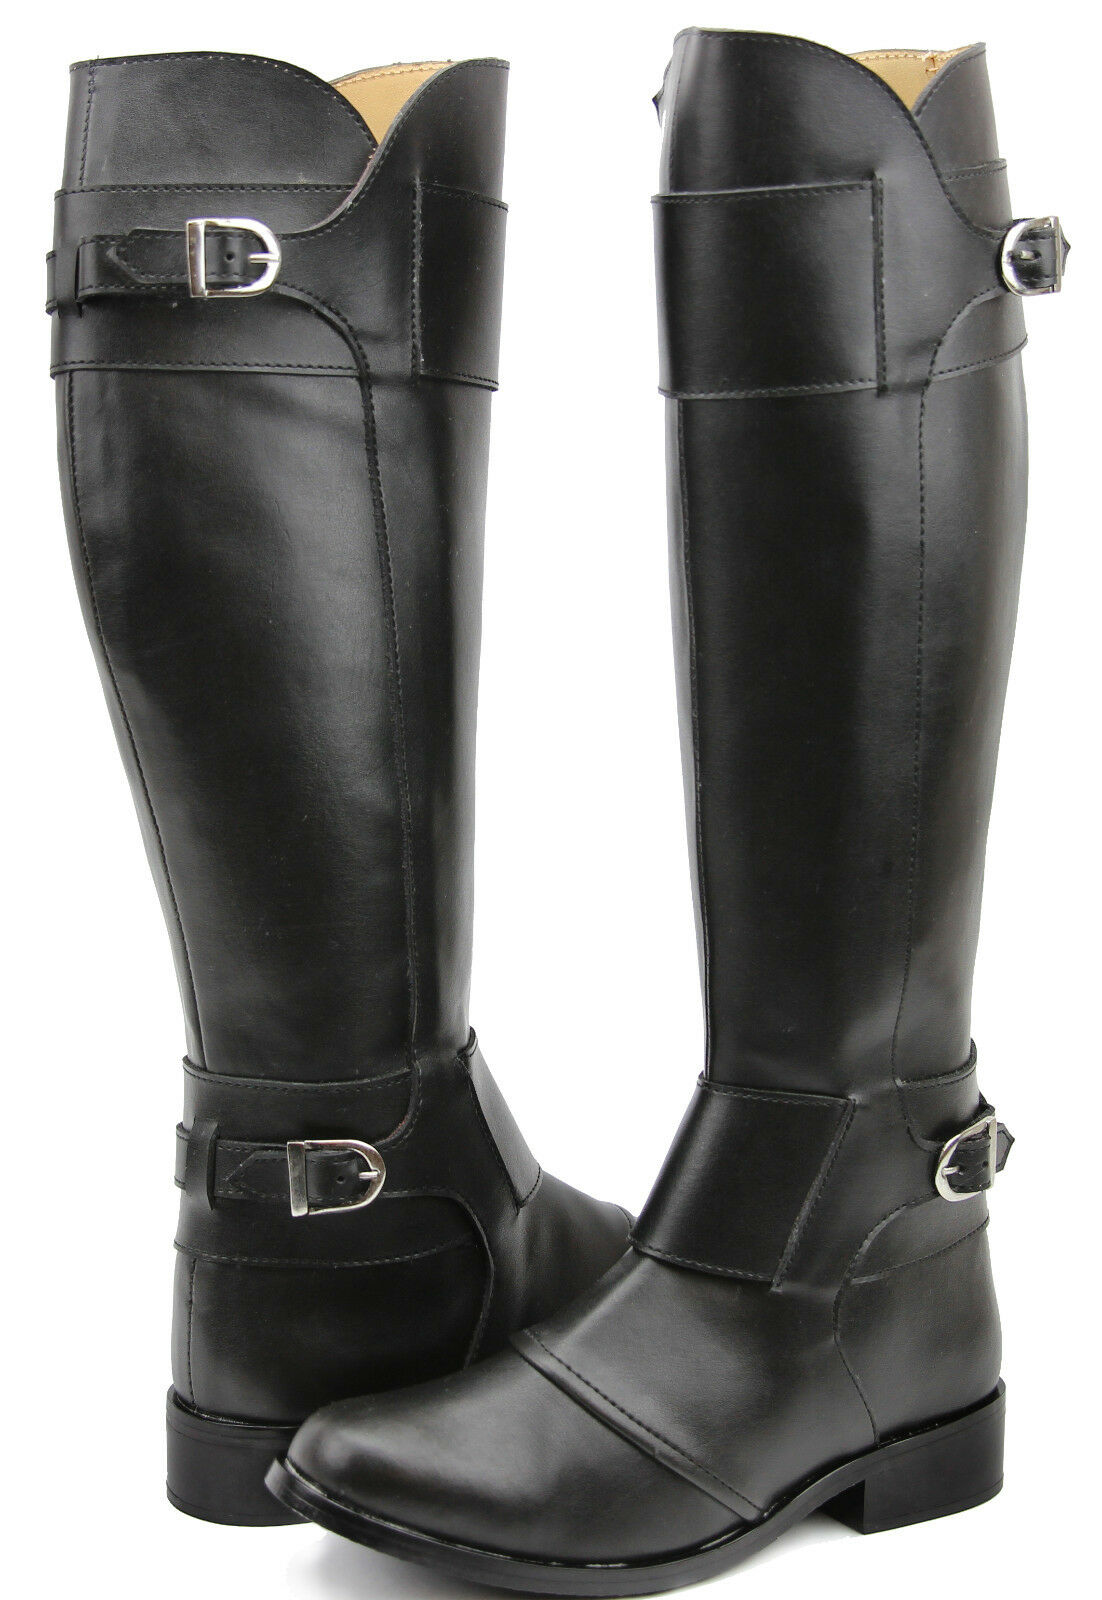 FAMMZ Women Ladies Desire Fashion Stylish Motorcycle Riding Tall Knee High Boots